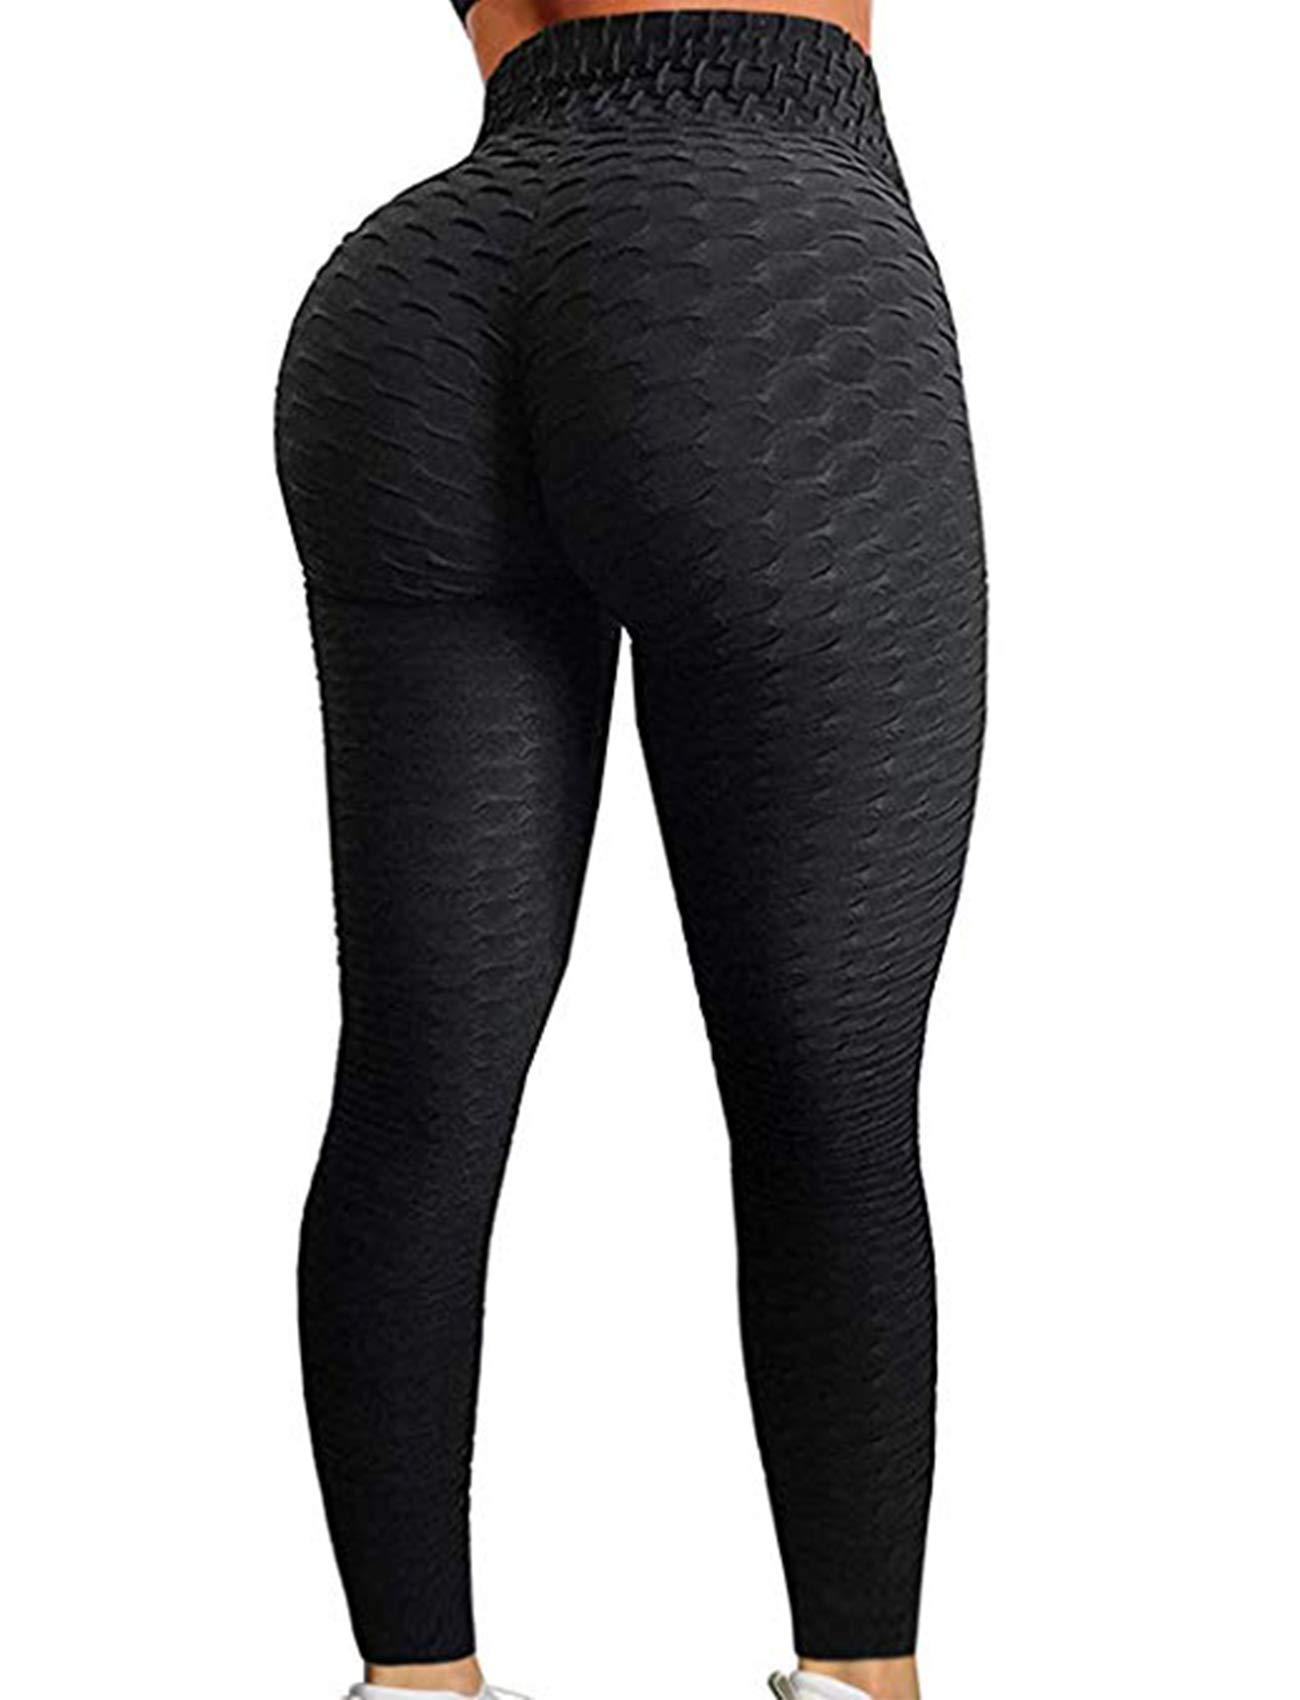 Gliorai Yoga Pants Scrunch Leggings Booty High Waist Tight Legging Pants